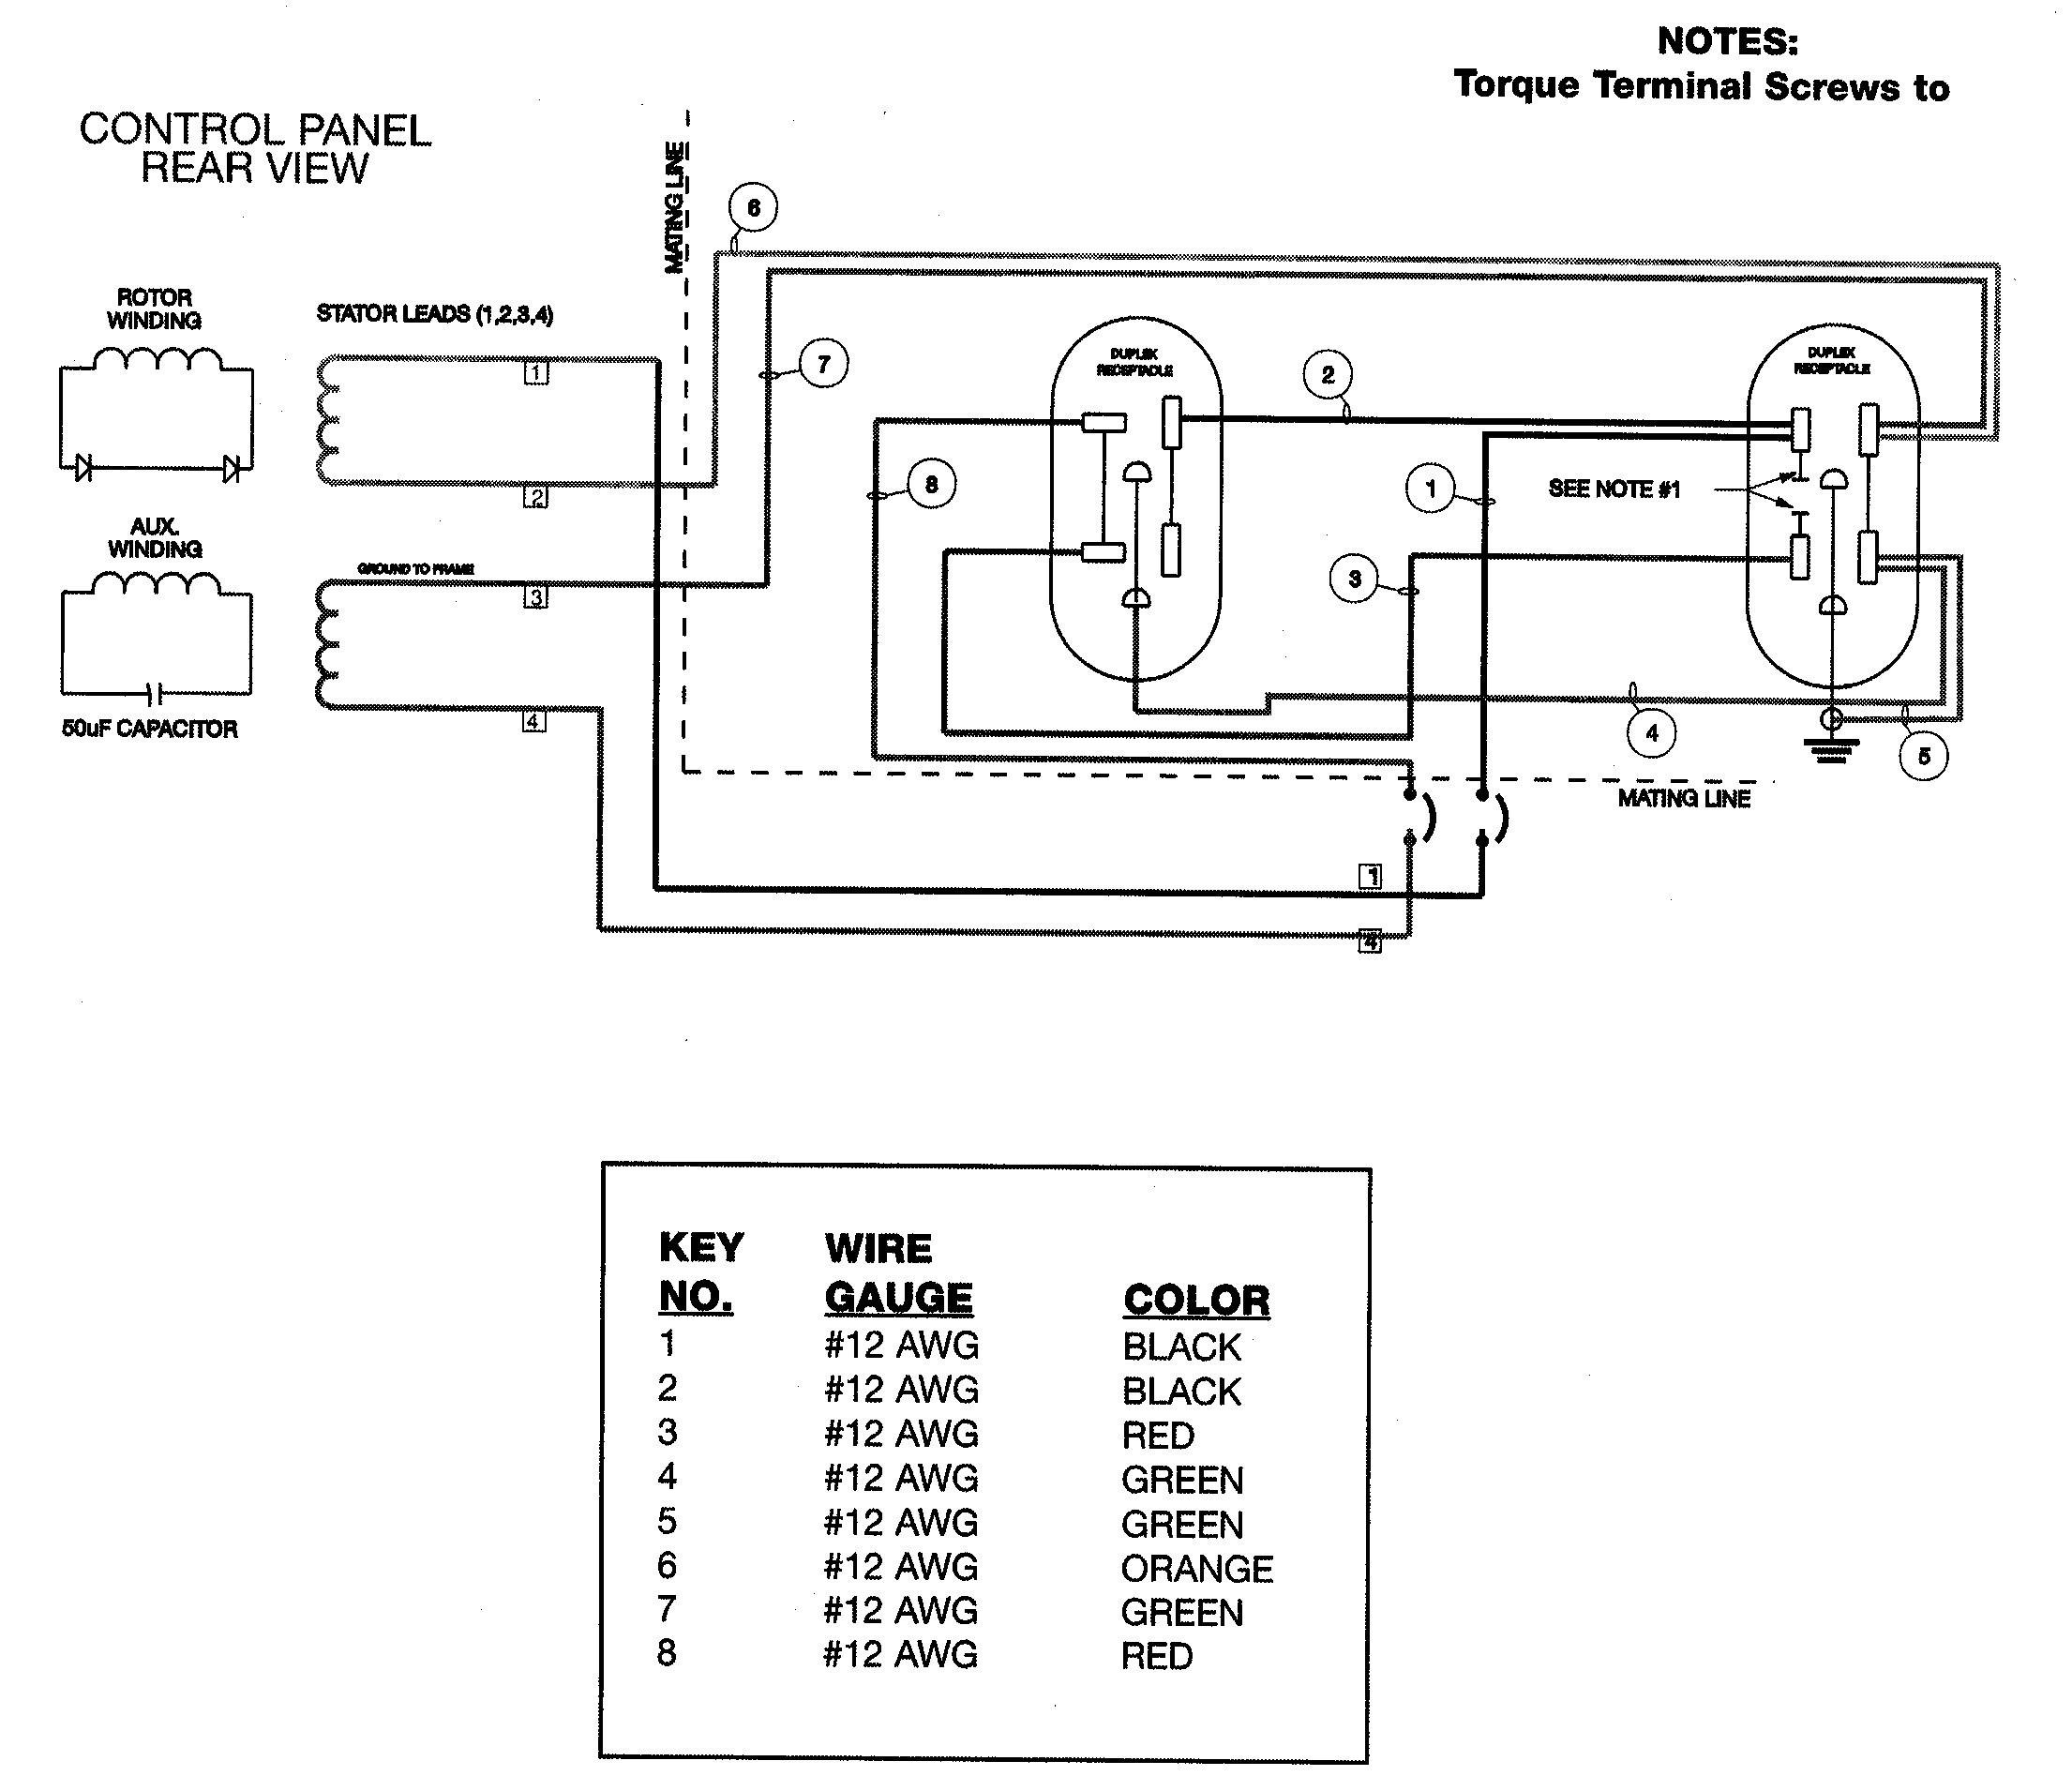 L14 30p Wiring Diagram Generator Cord Wiring Diagram 2018 Wiring Diagram 30 Amp Generator Of L14 30p Wiring Diagram Nema Wiring Diagram Wire Data Schema •